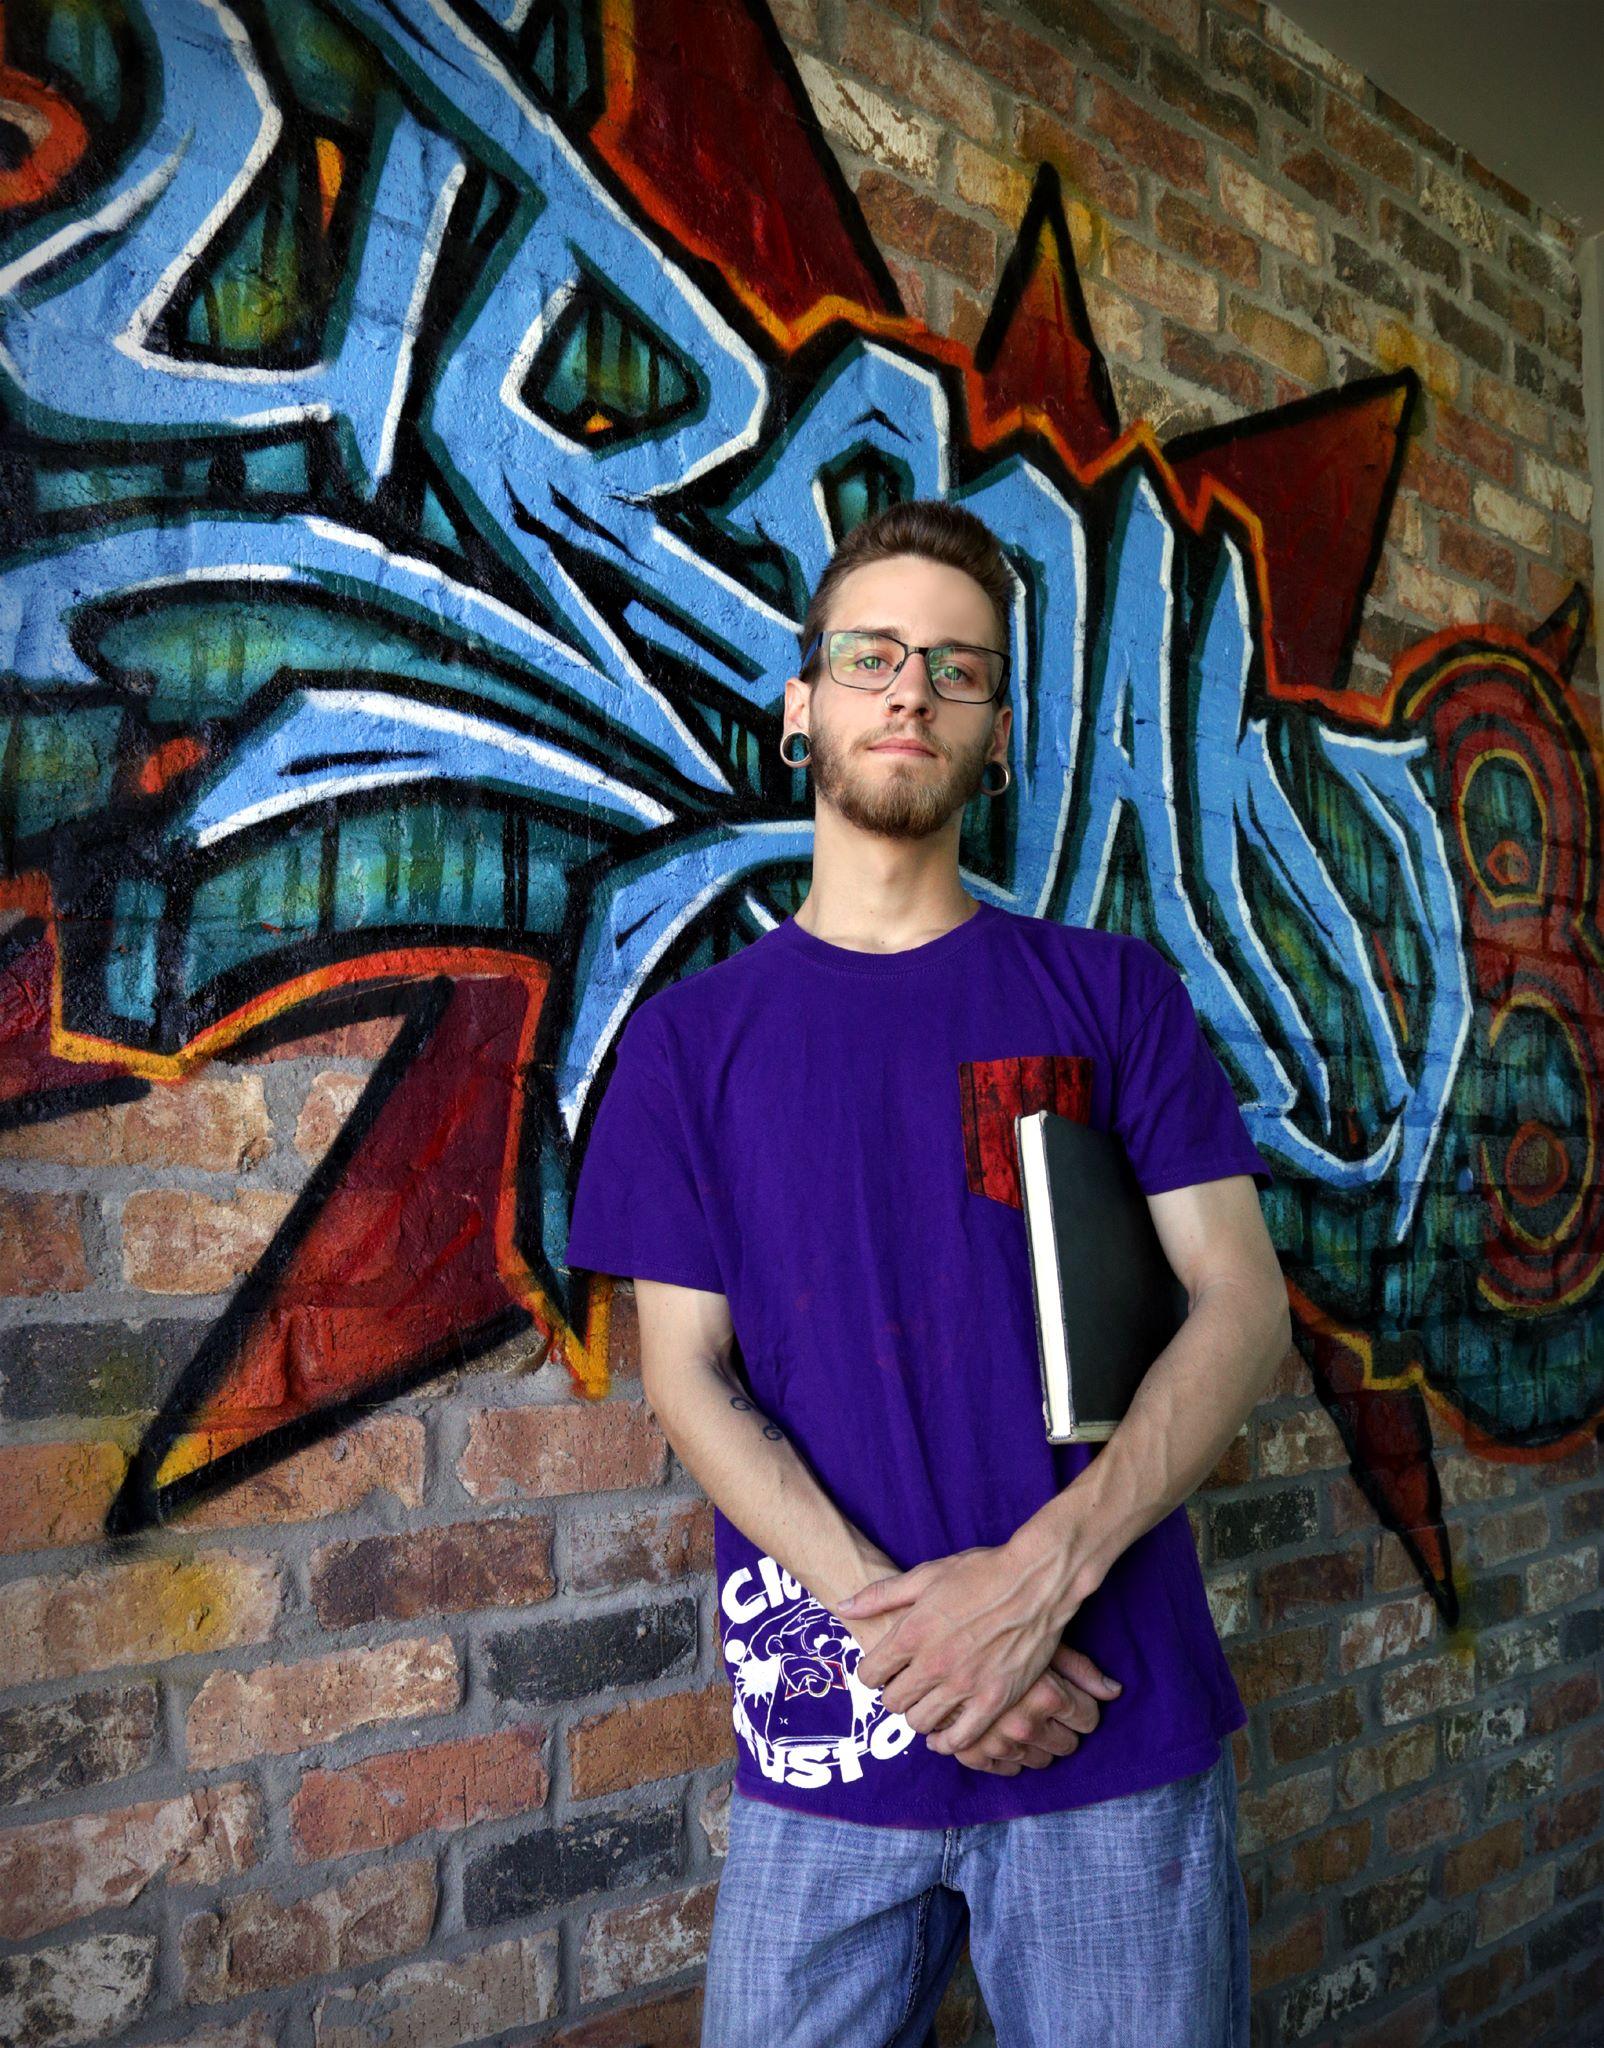 Graffiti artist Beau Raines